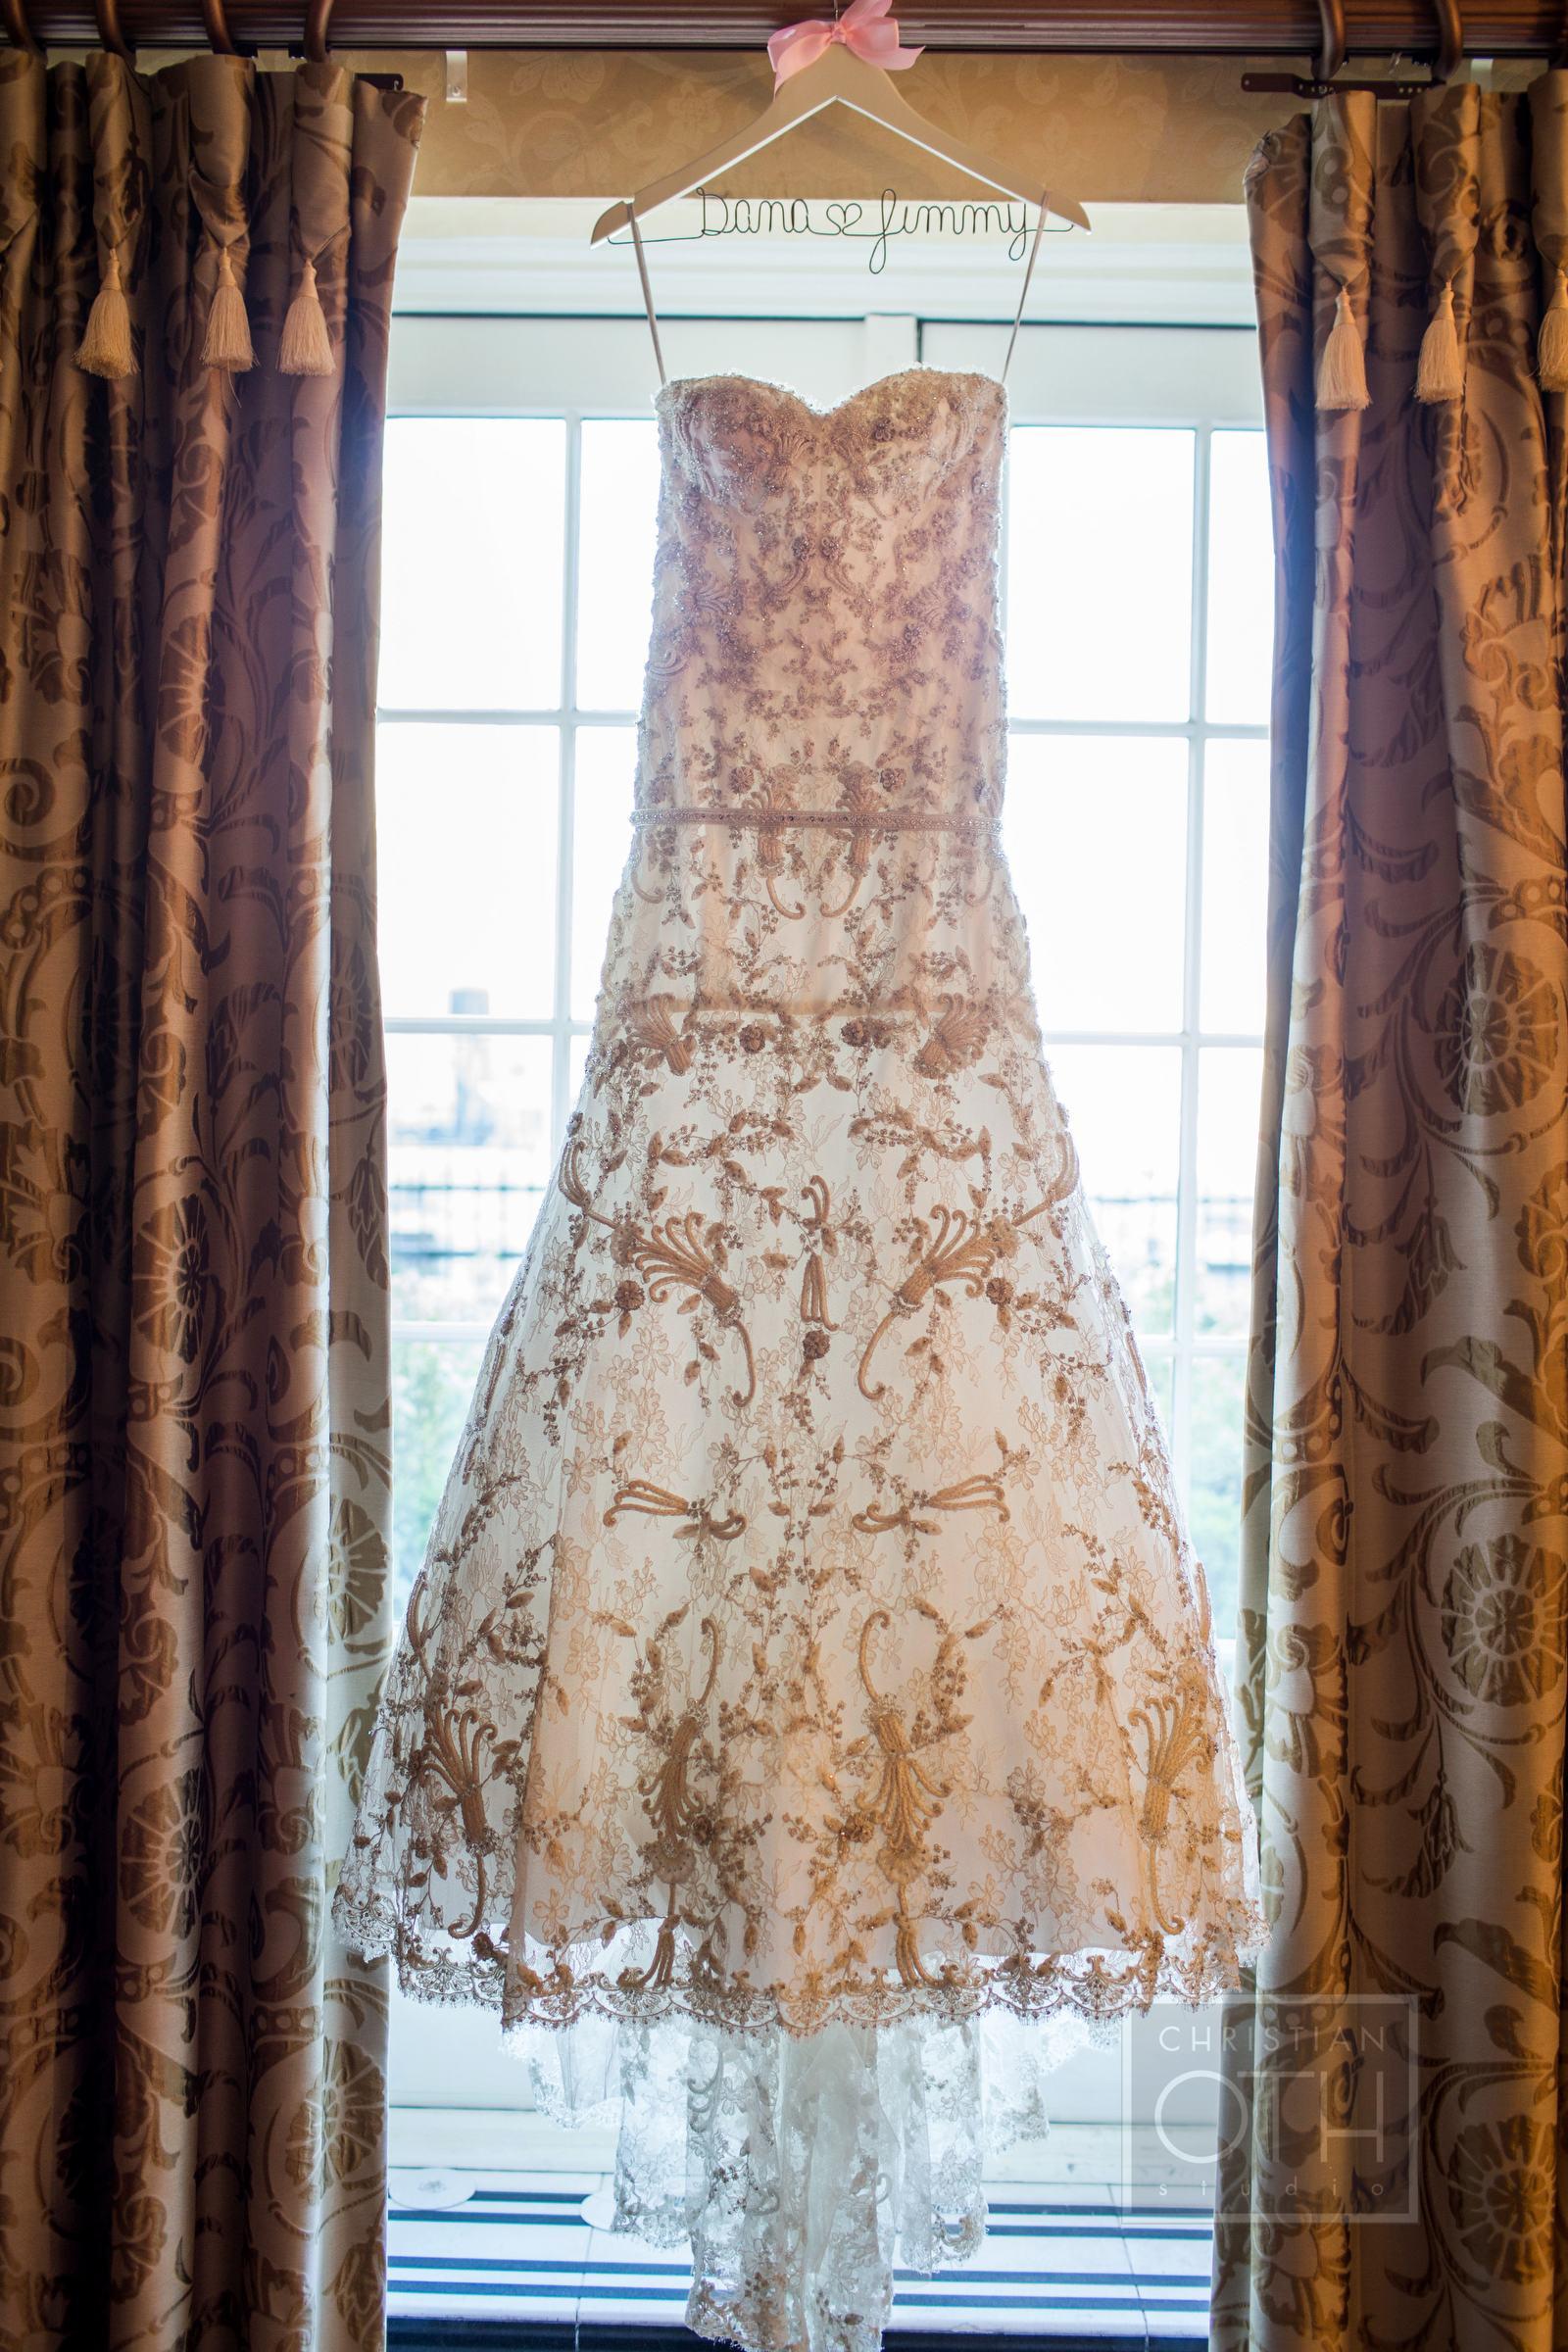 Ceci_New_York_Custom_Invitation_Pierre__City_ Destination_Wedding_Luxury_Personalized_Ceci_Style_Bride_Rose_Gold_Foil_Stamping9.JPG